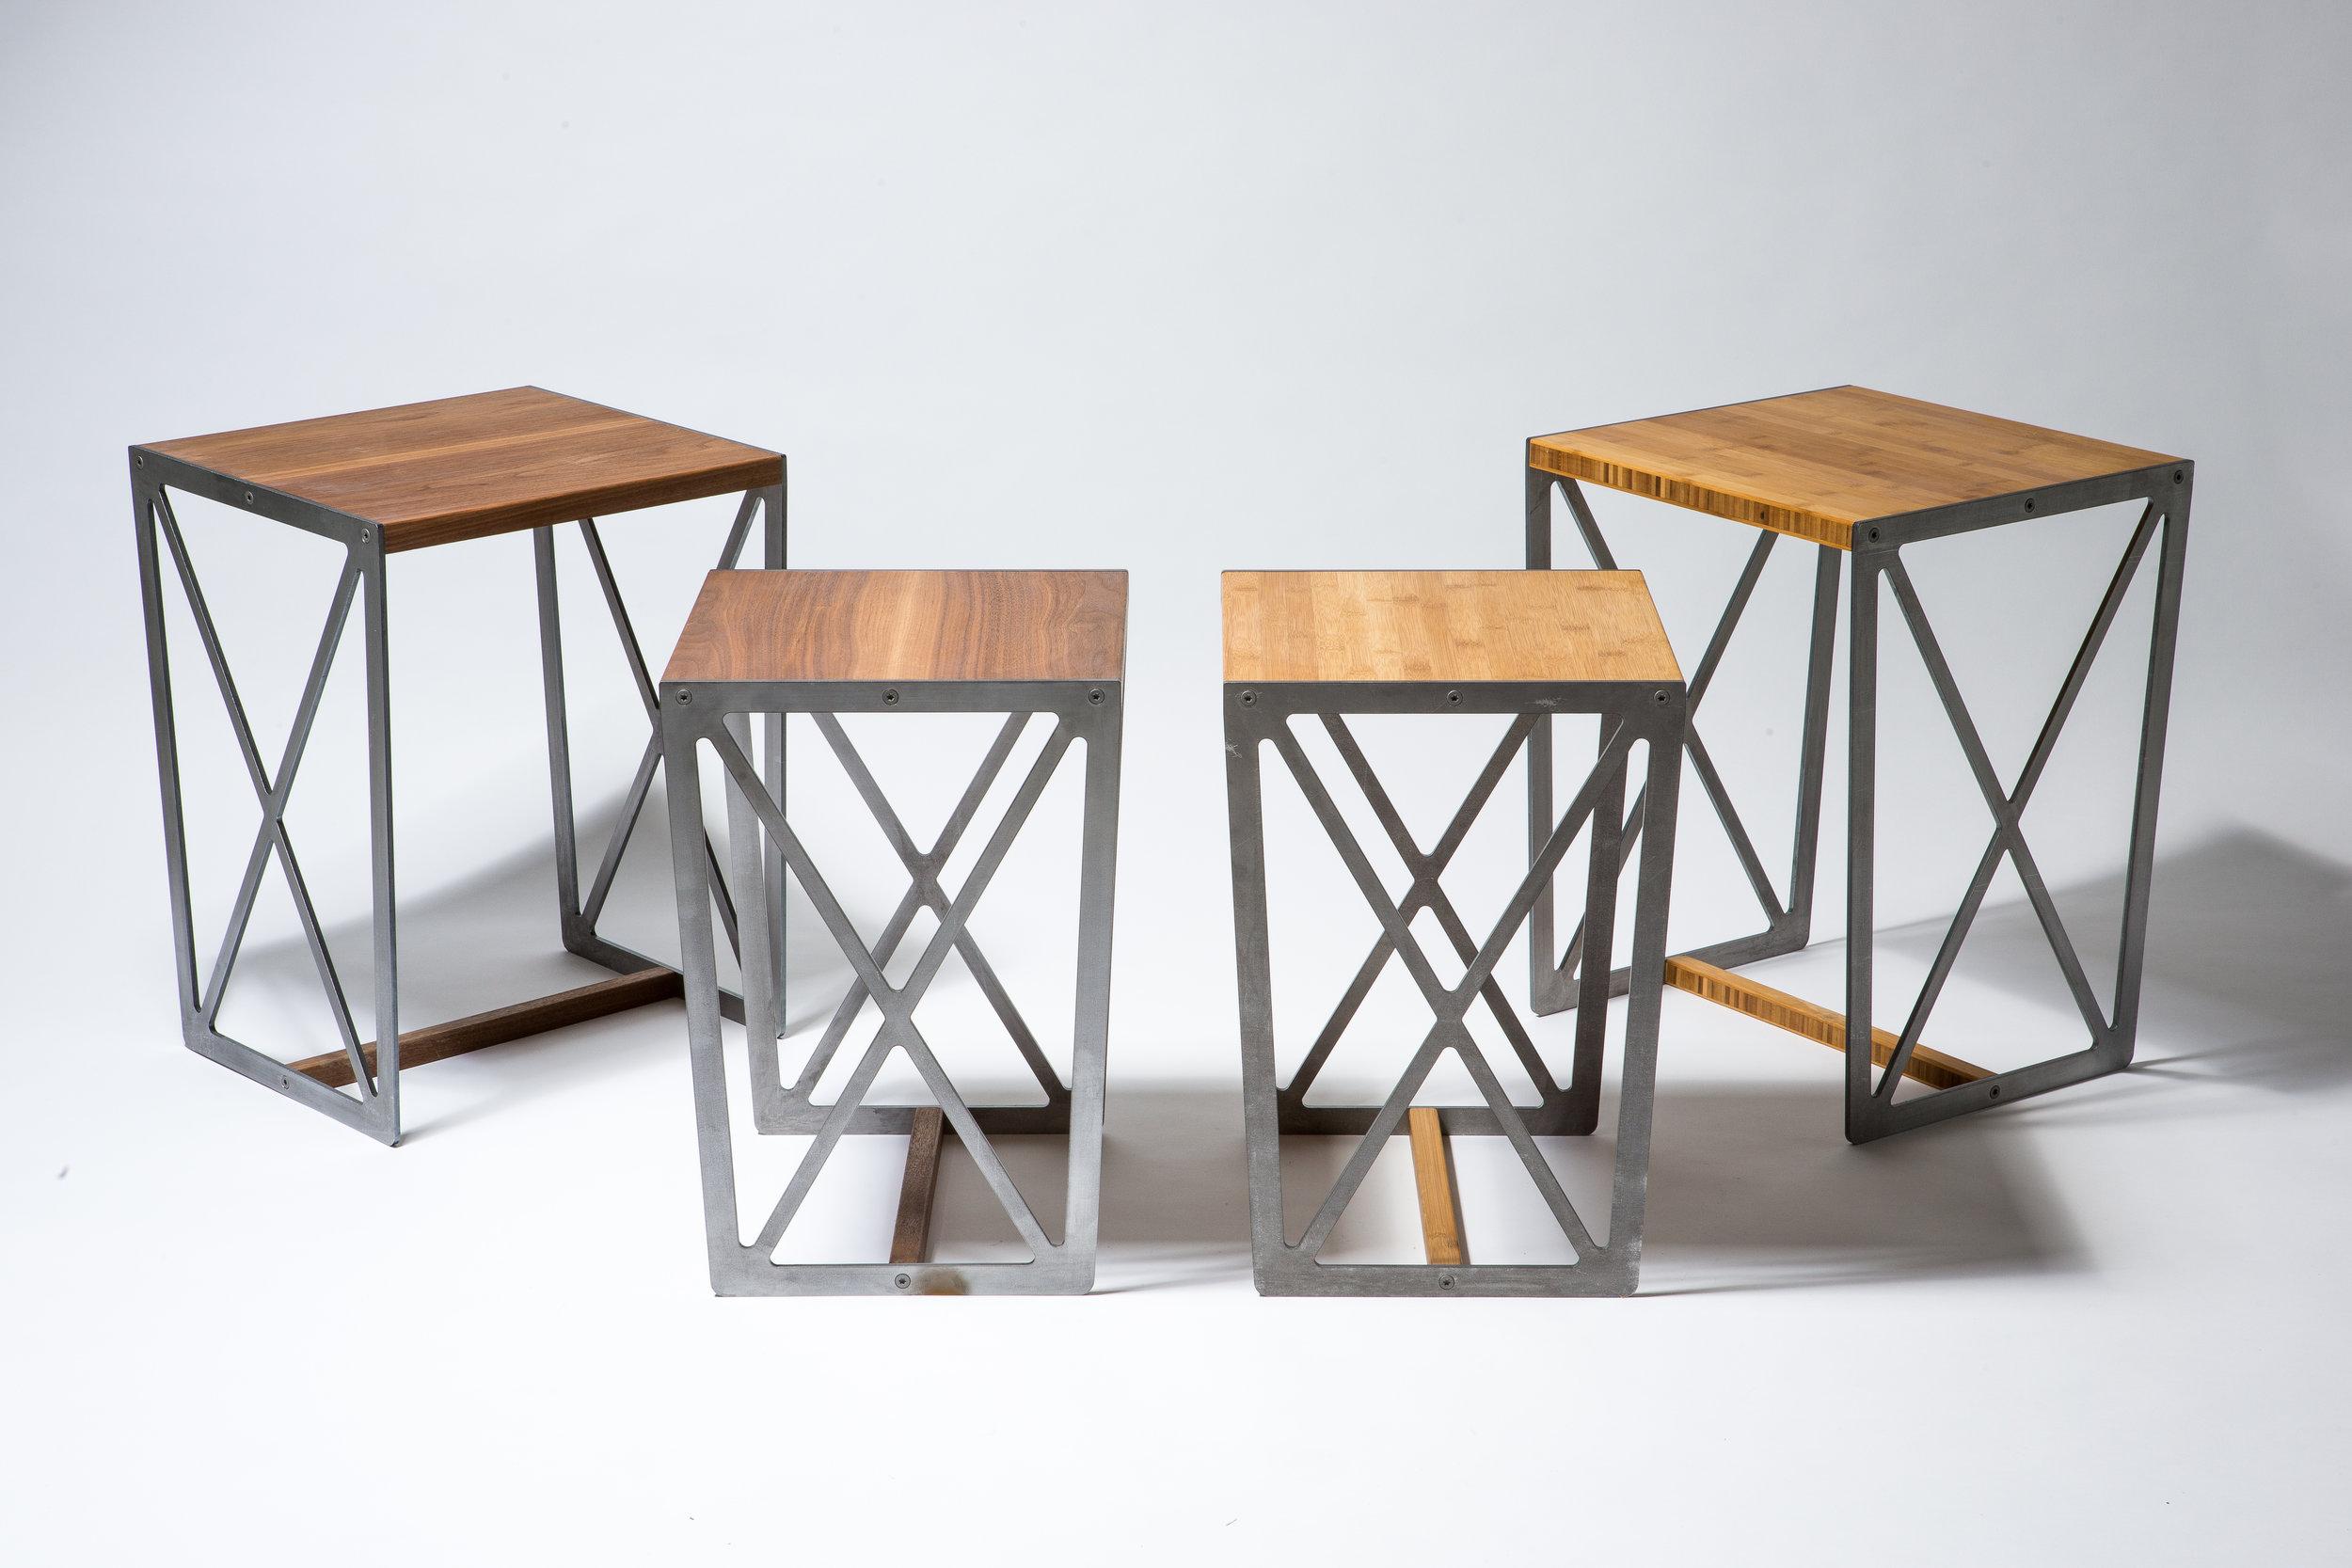 24-RIchard-Ganas-Tables-8970.jpg